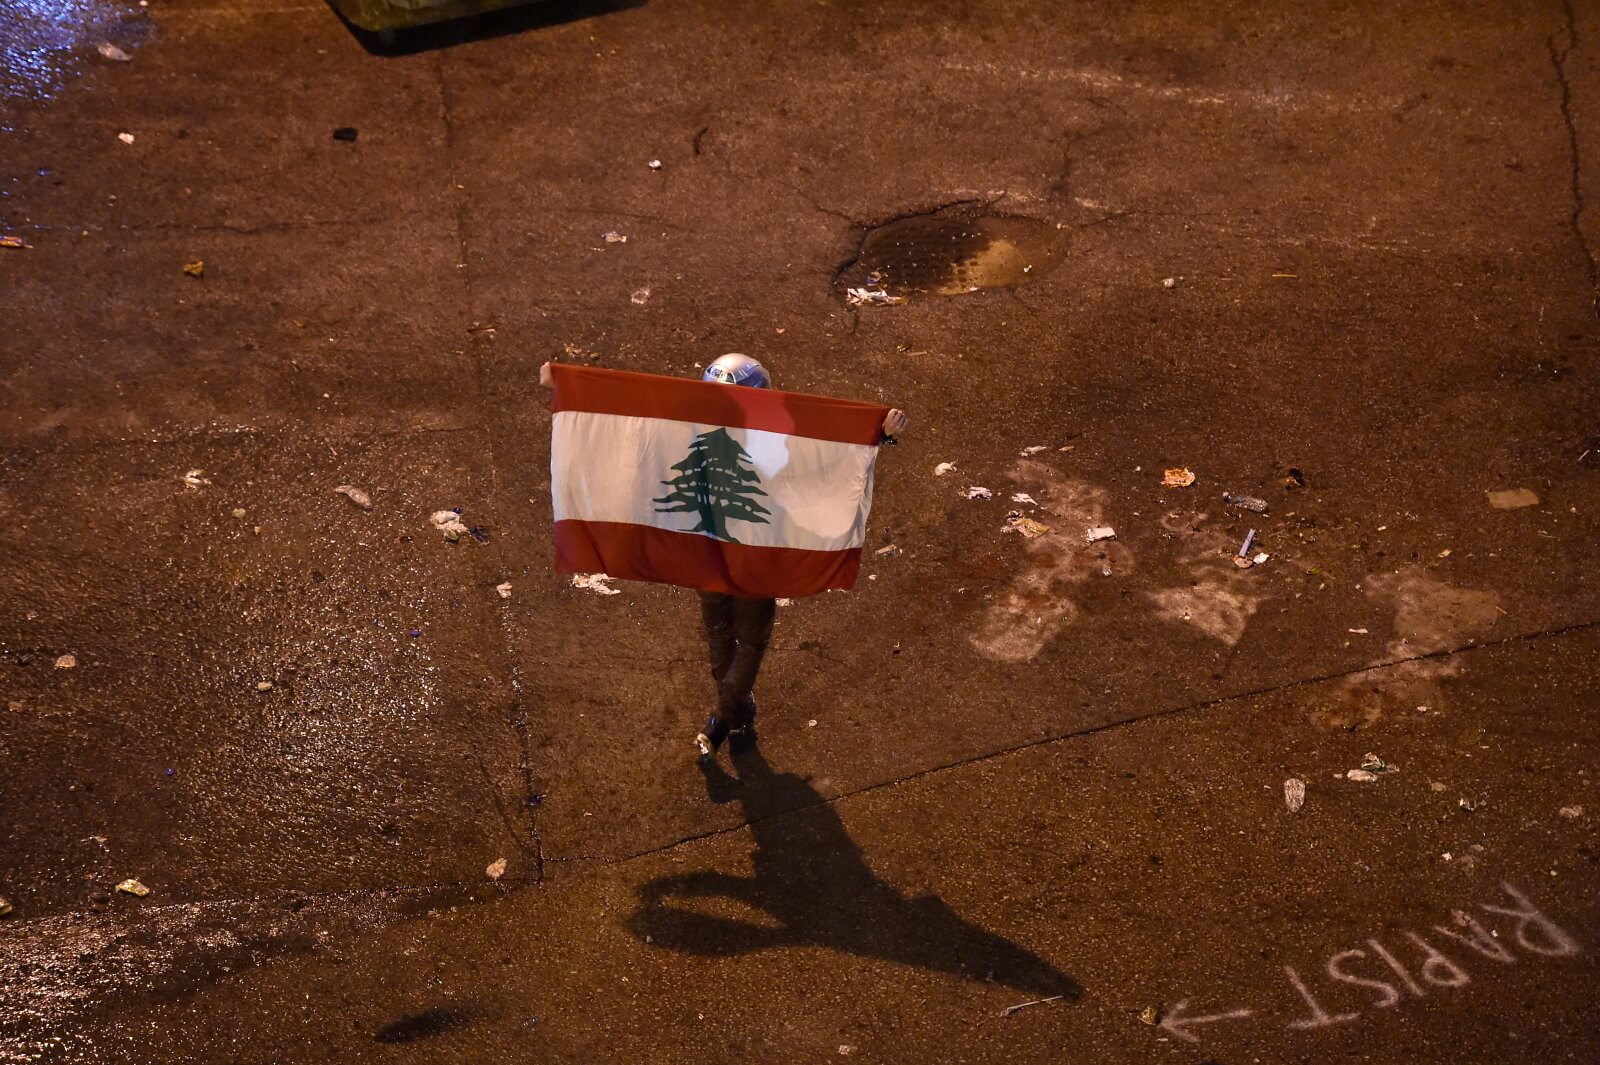 Protesty w Beirucie fot. EPA/WAEL HAMZEH